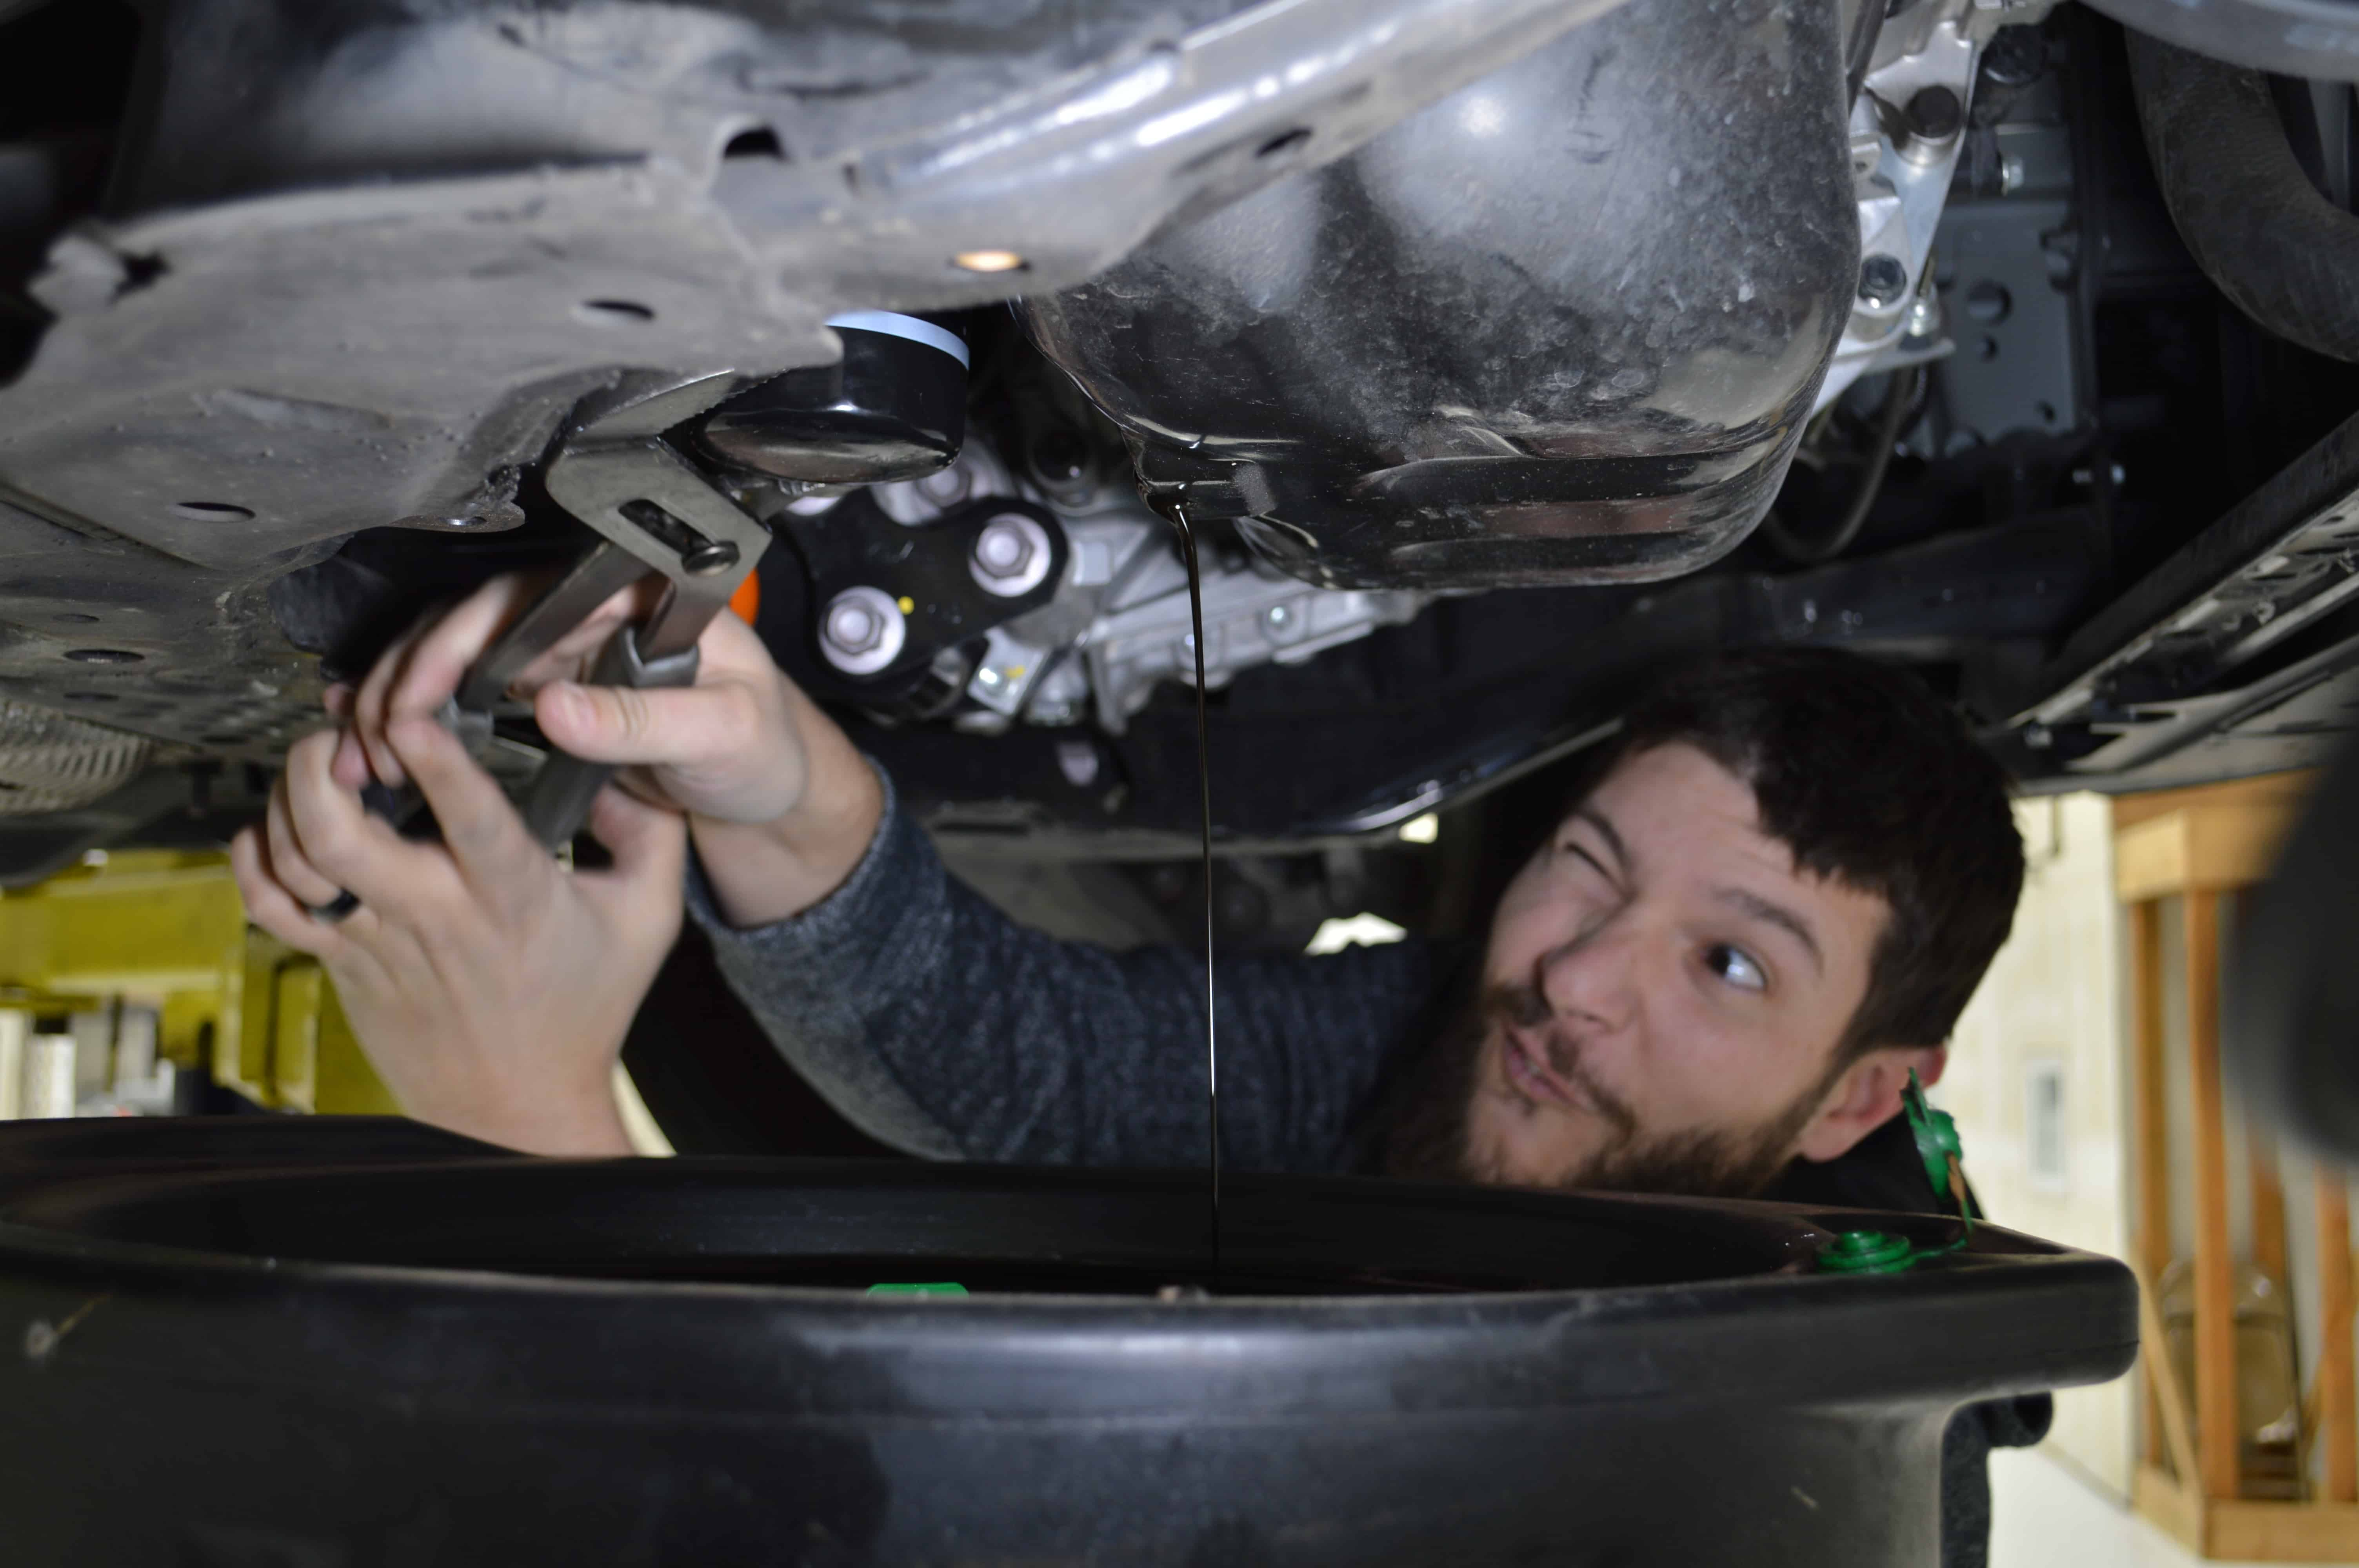 Corksport Q A Skyactiv G Ideal Oil For Your Mazda